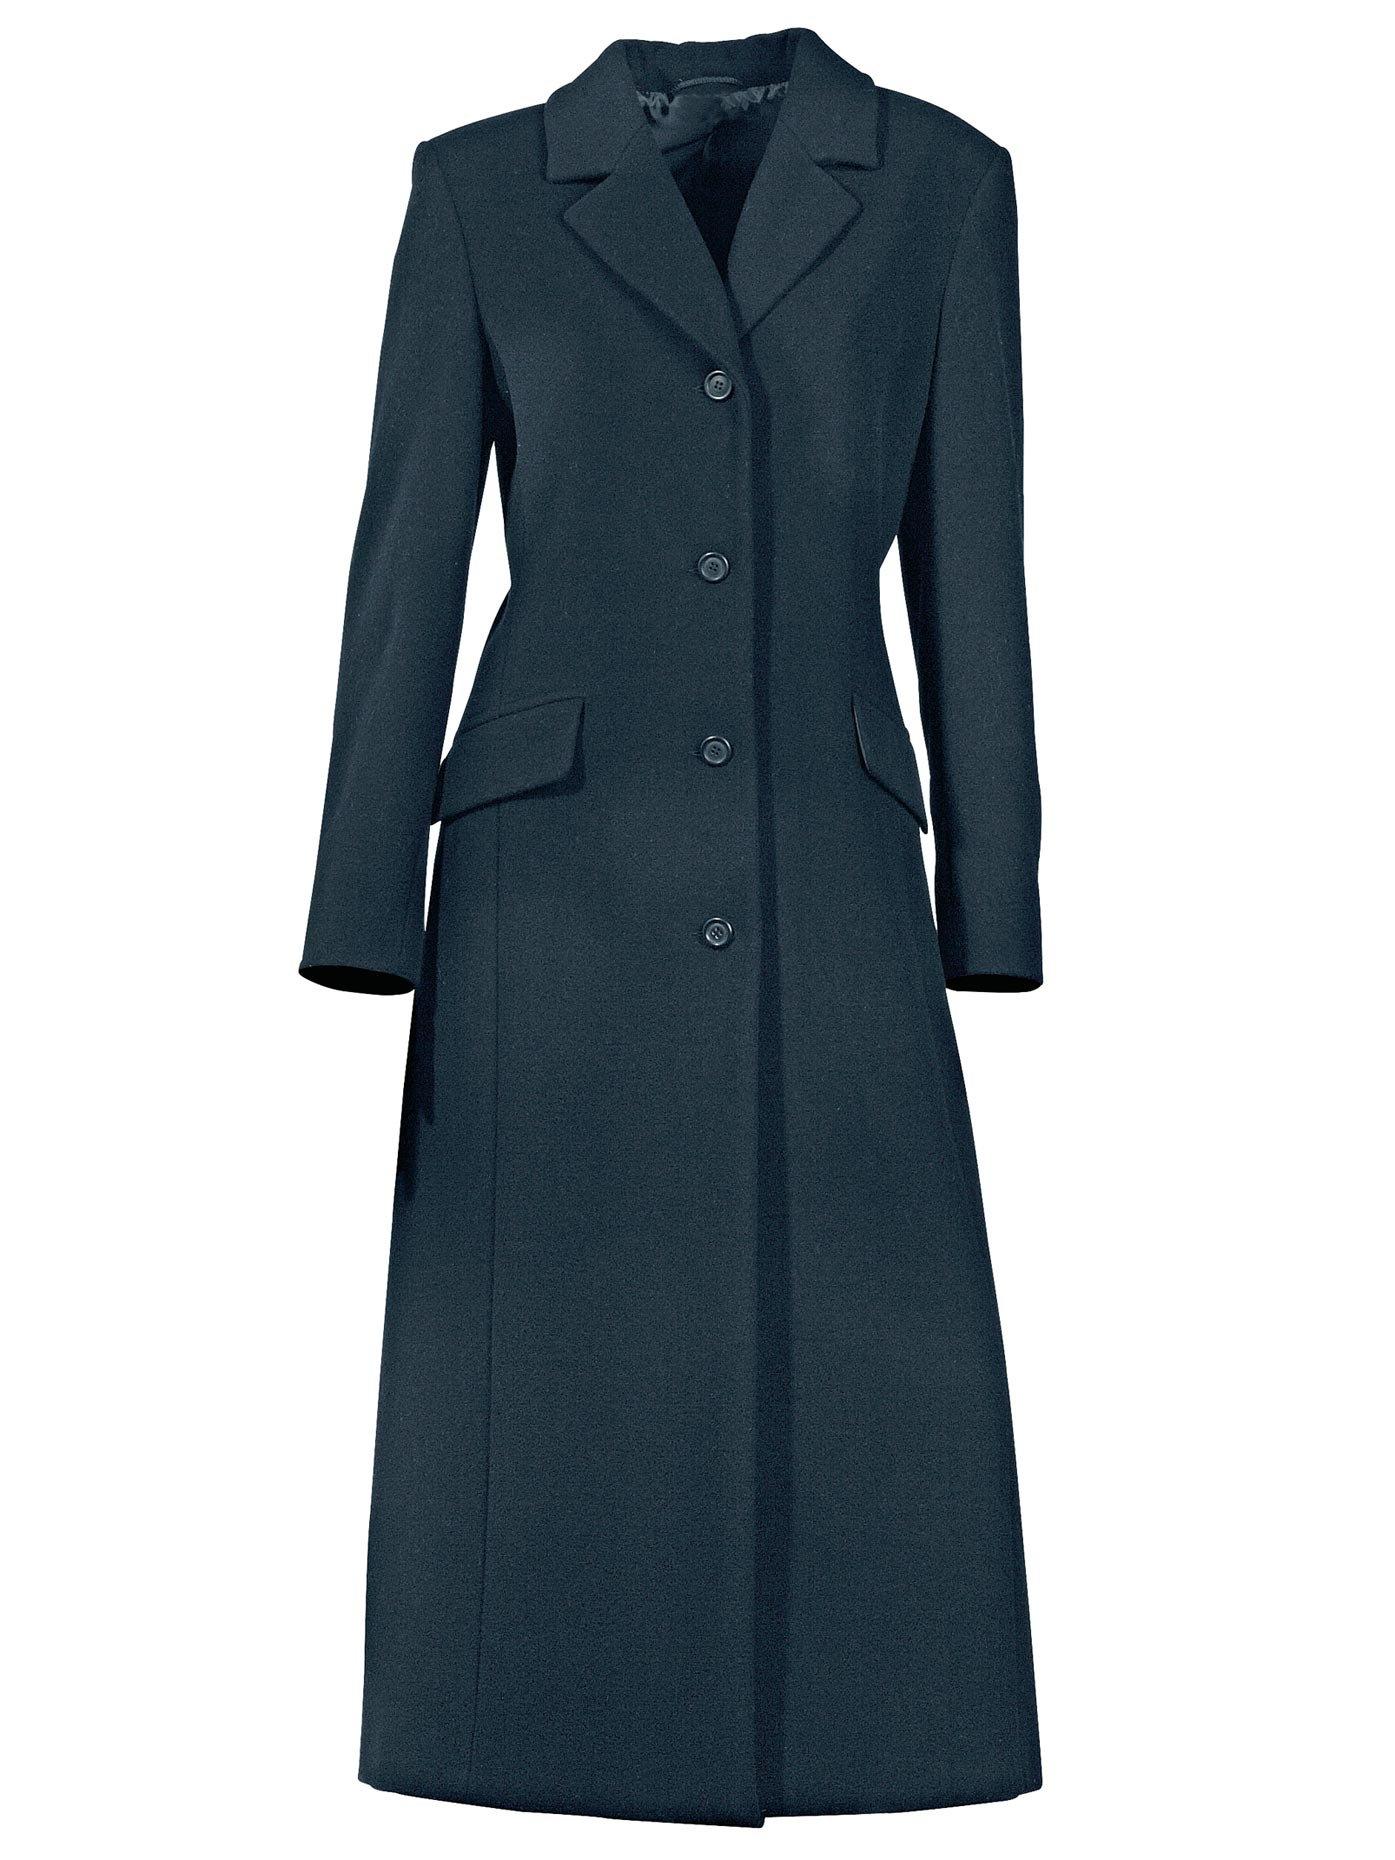 LINEA TESINI by Heine wollen jas met wol goedkoop op otto.nl kopen